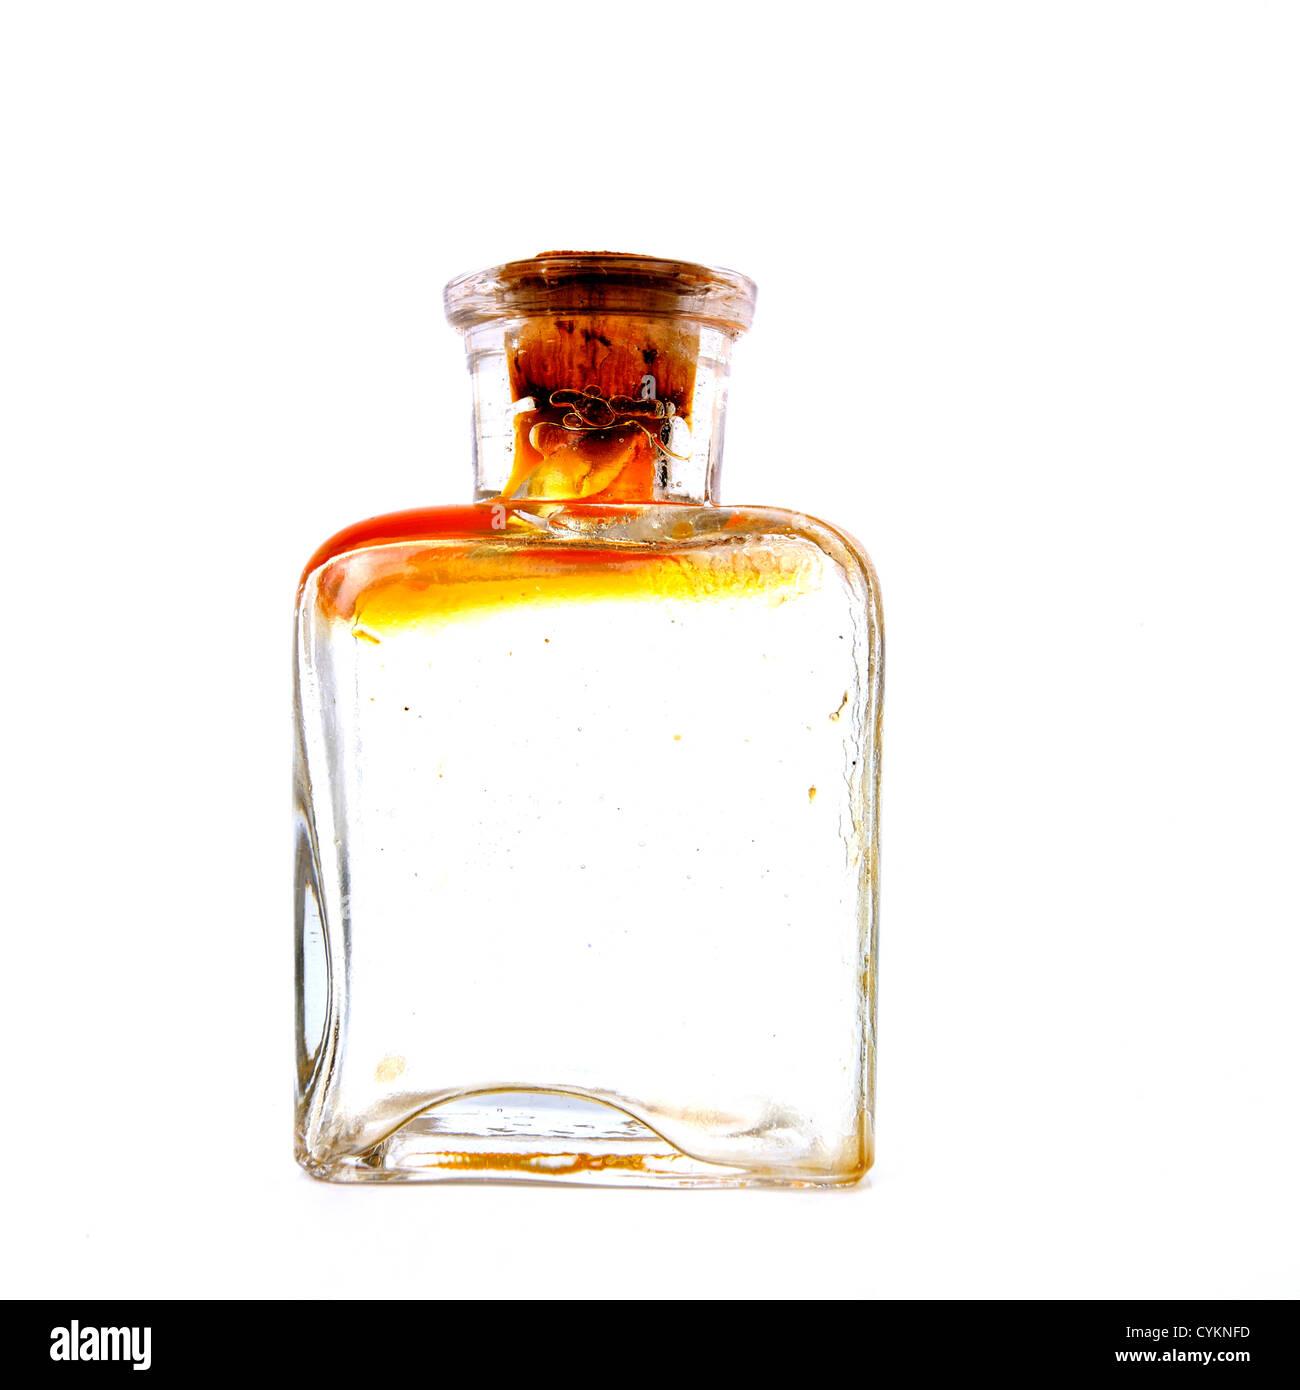 Alte Glasflasche mit Kork. Stockbild